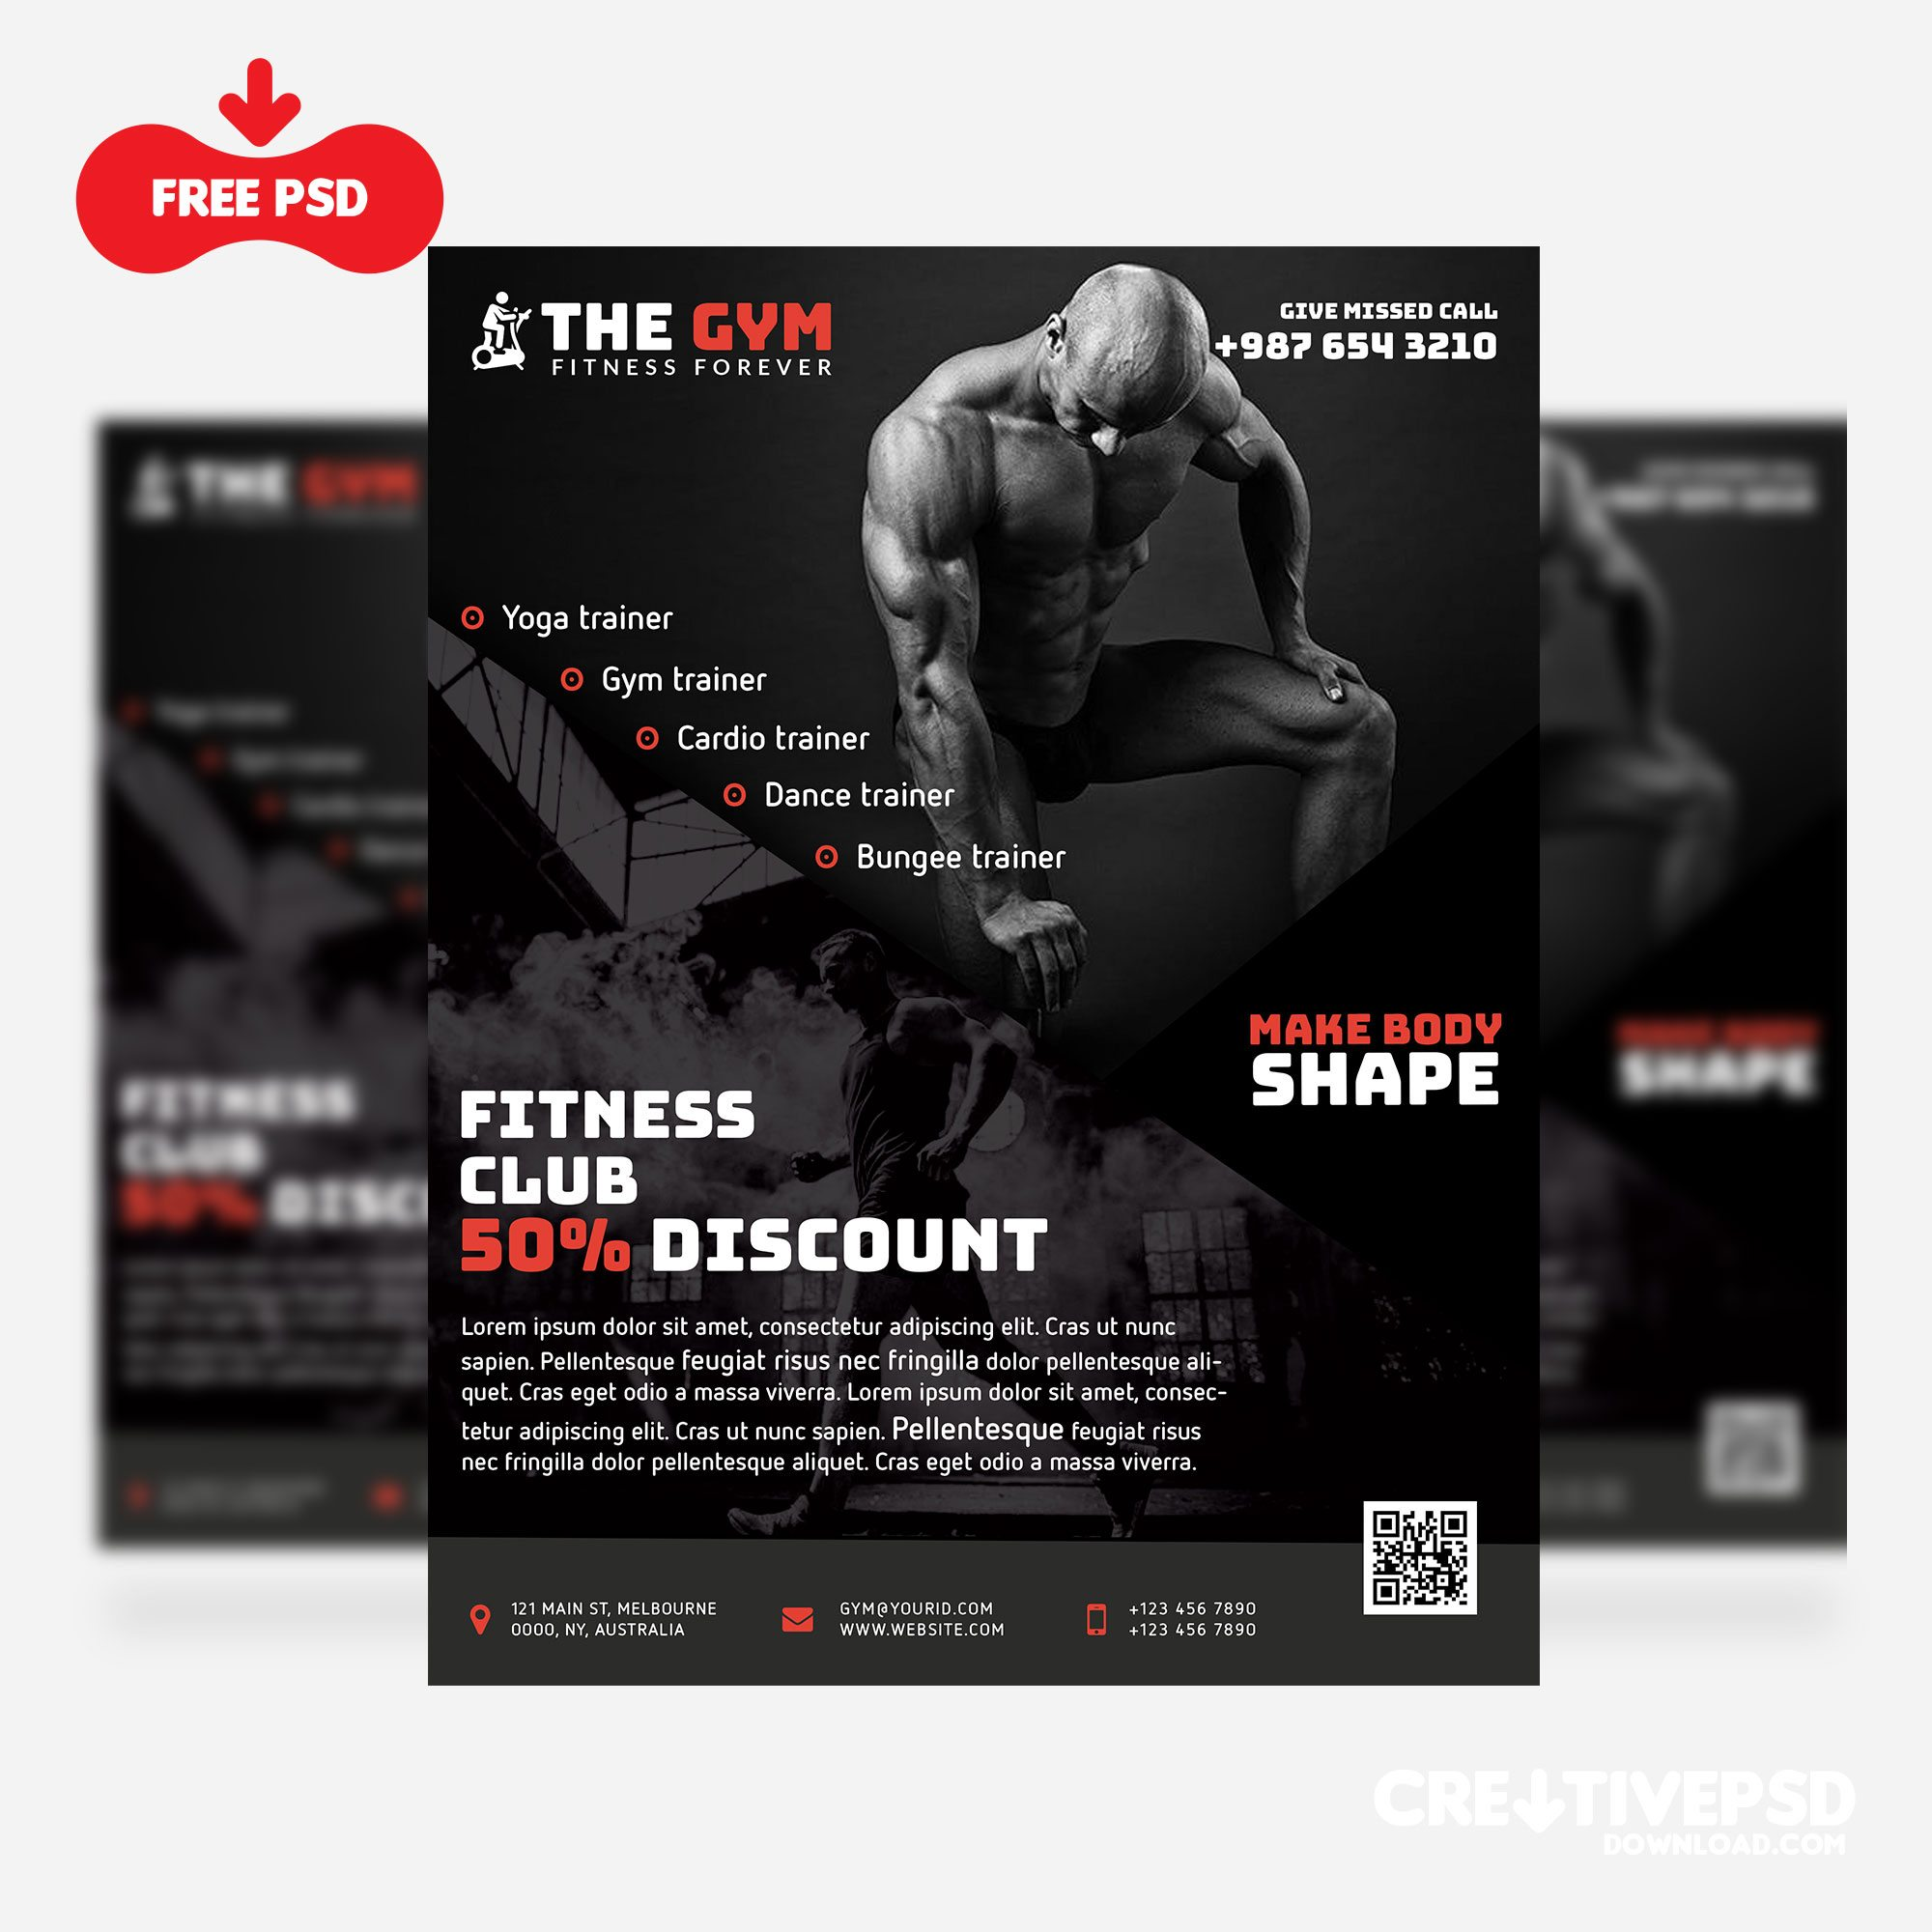 The Gym Fitness Flyer Freebie PSD Thumbnail, creative,creative psd,creative psd download,fitness flyer psd,fitness flyer template,flyer mockup,free flyer psd download,free psd download,freebies psd,psd freebies,the gym fitness flyer freebie psd